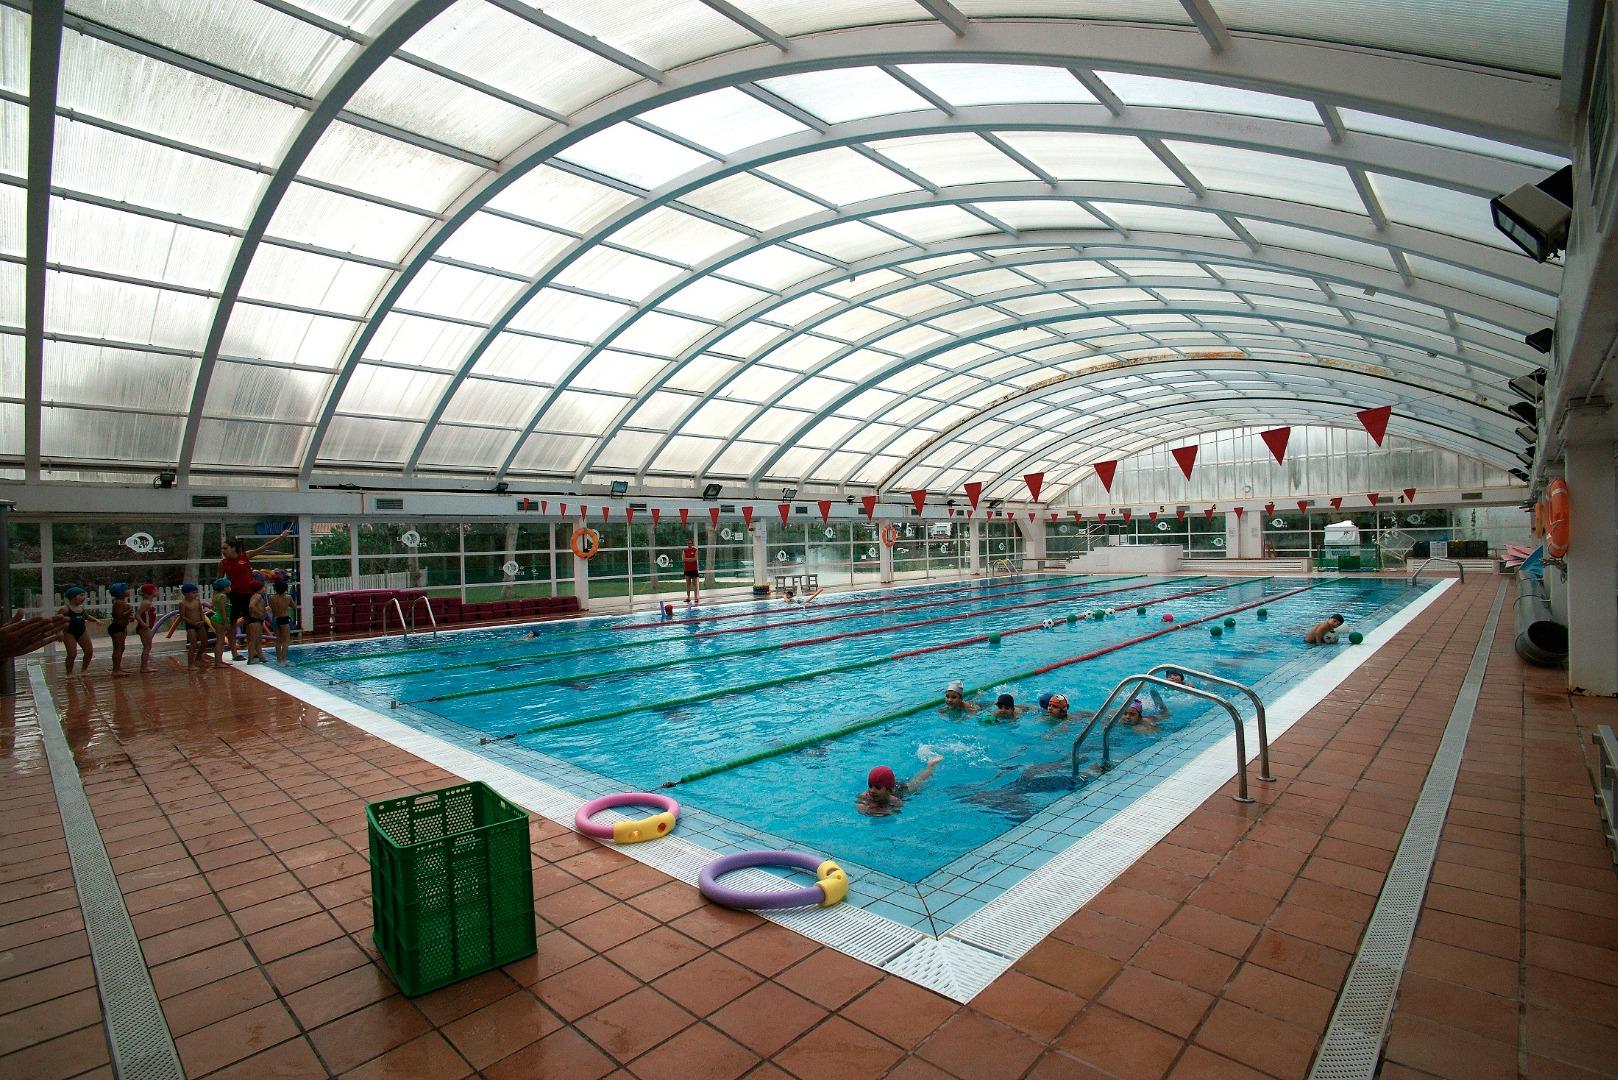 oferta gimnasio la piscina de piera piera gymforless